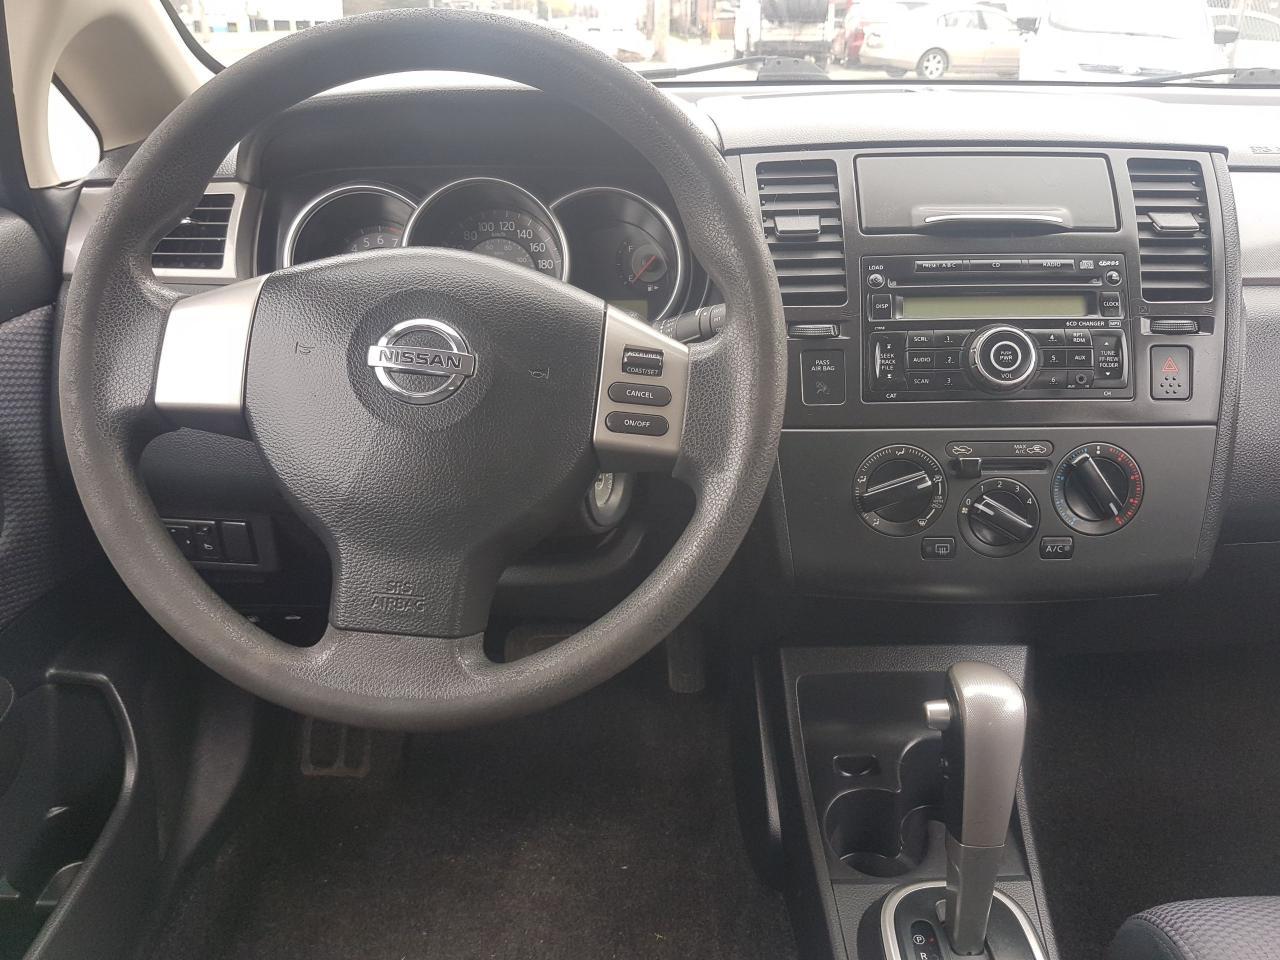 2008 Nissan Versa